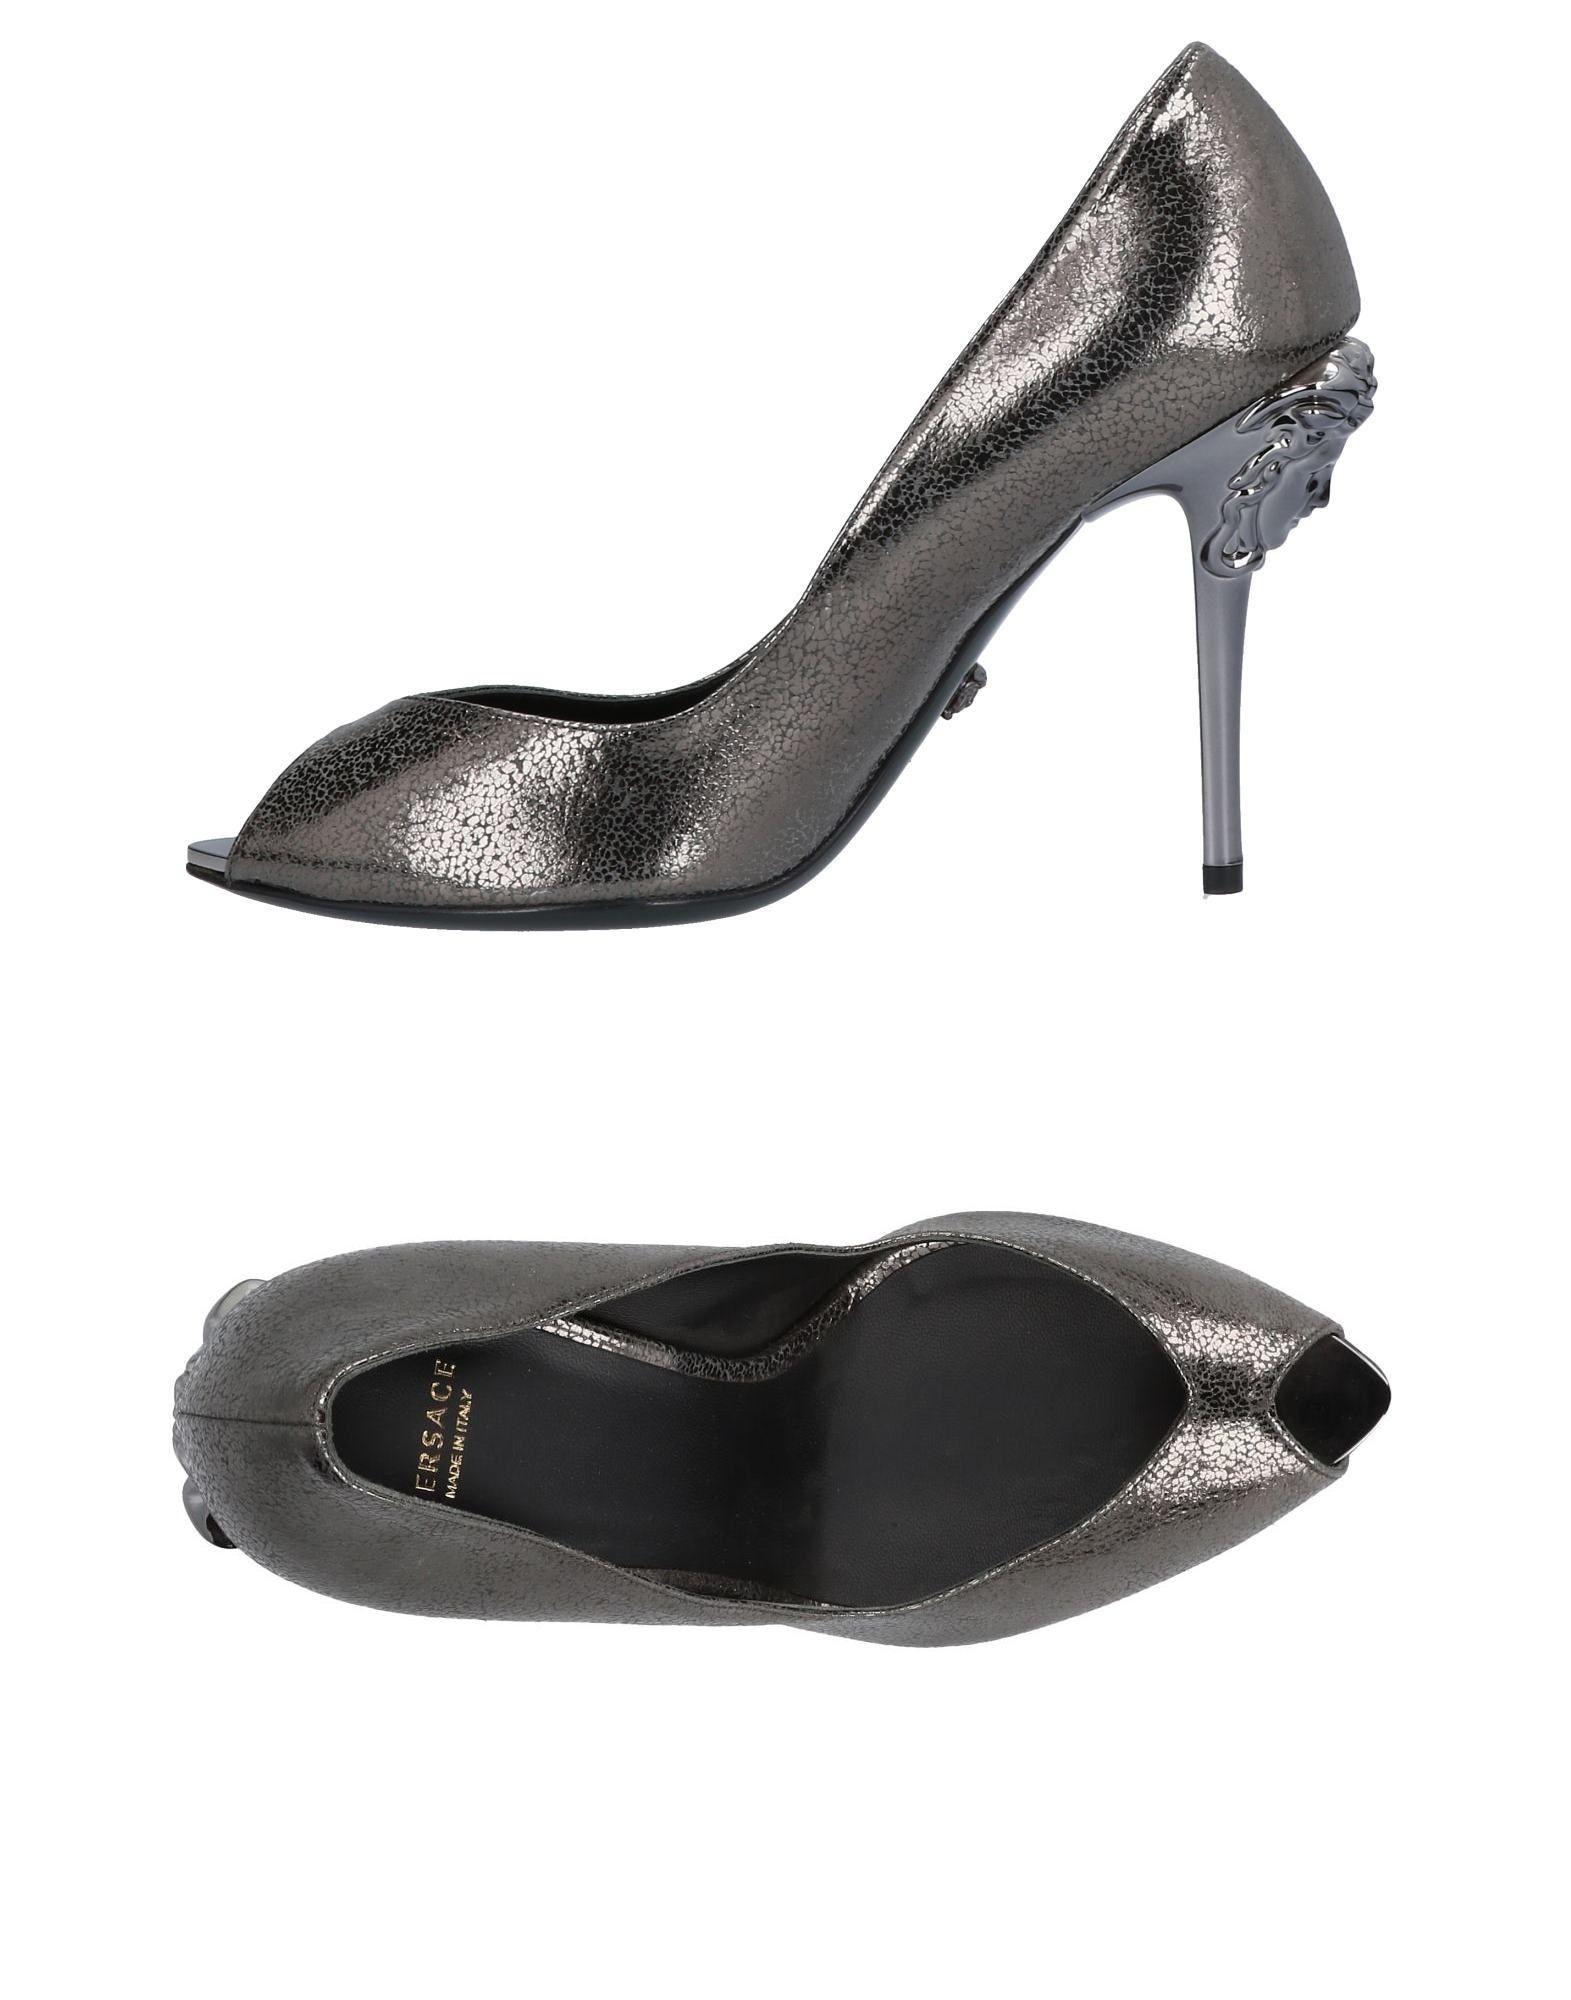 Versace Donna - 11200959CL